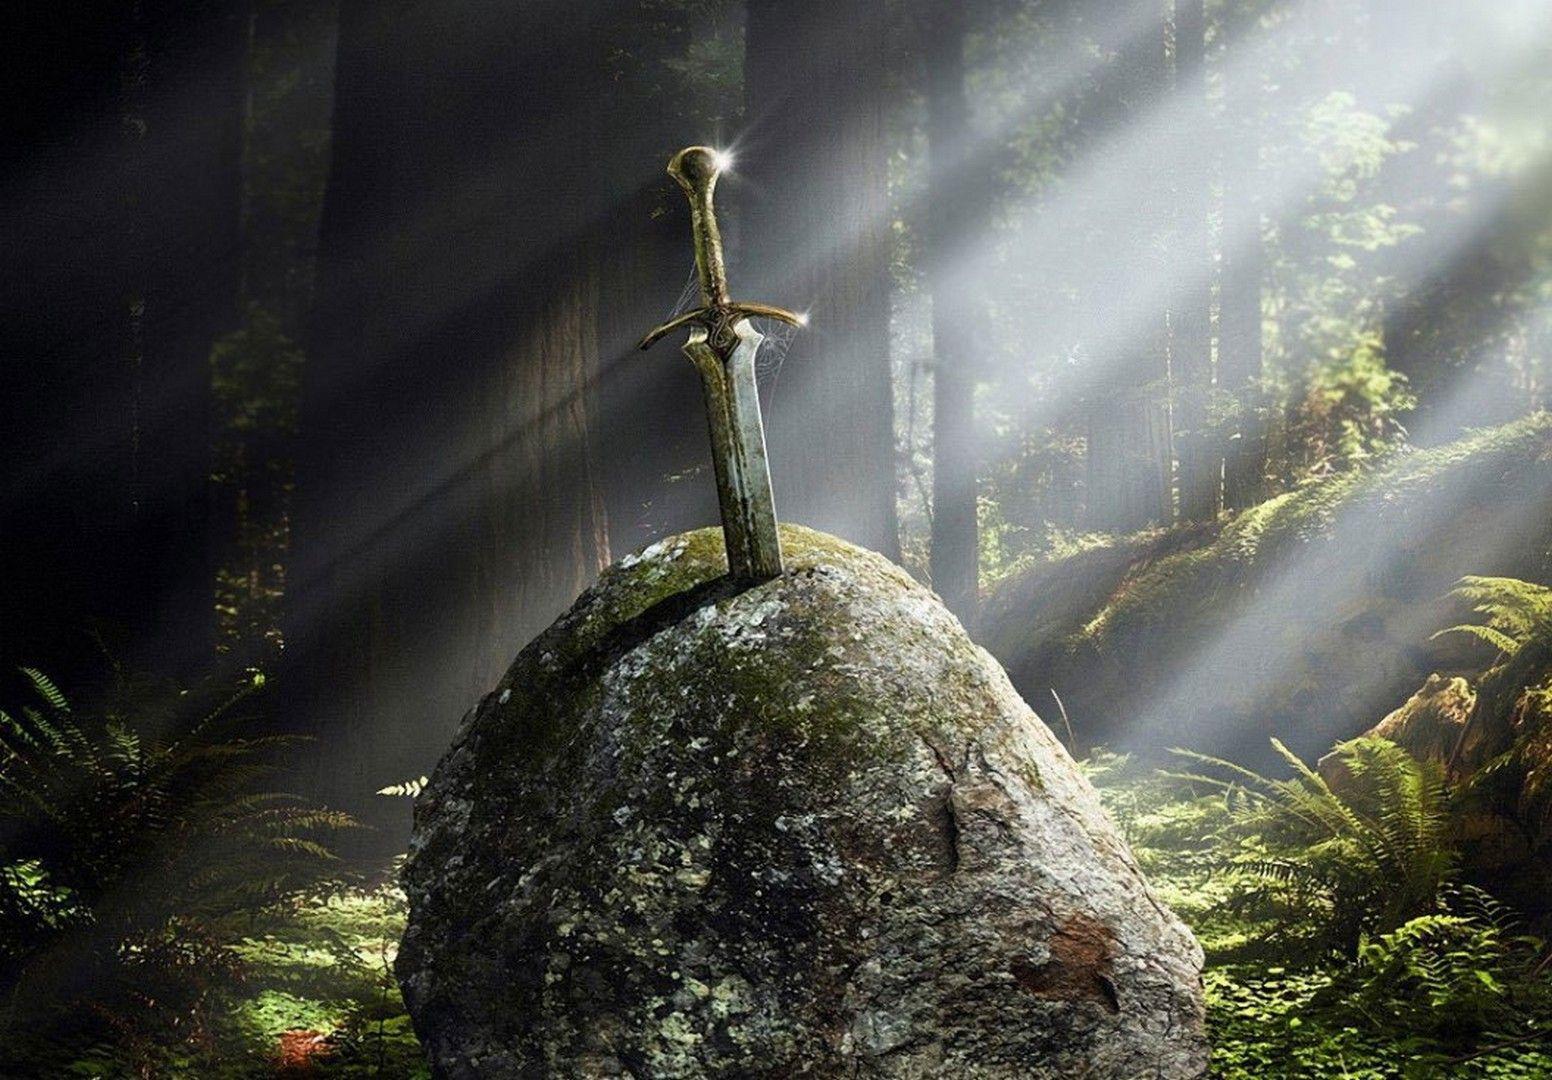 hd king arthur legend of the sword wallpaper king arthur